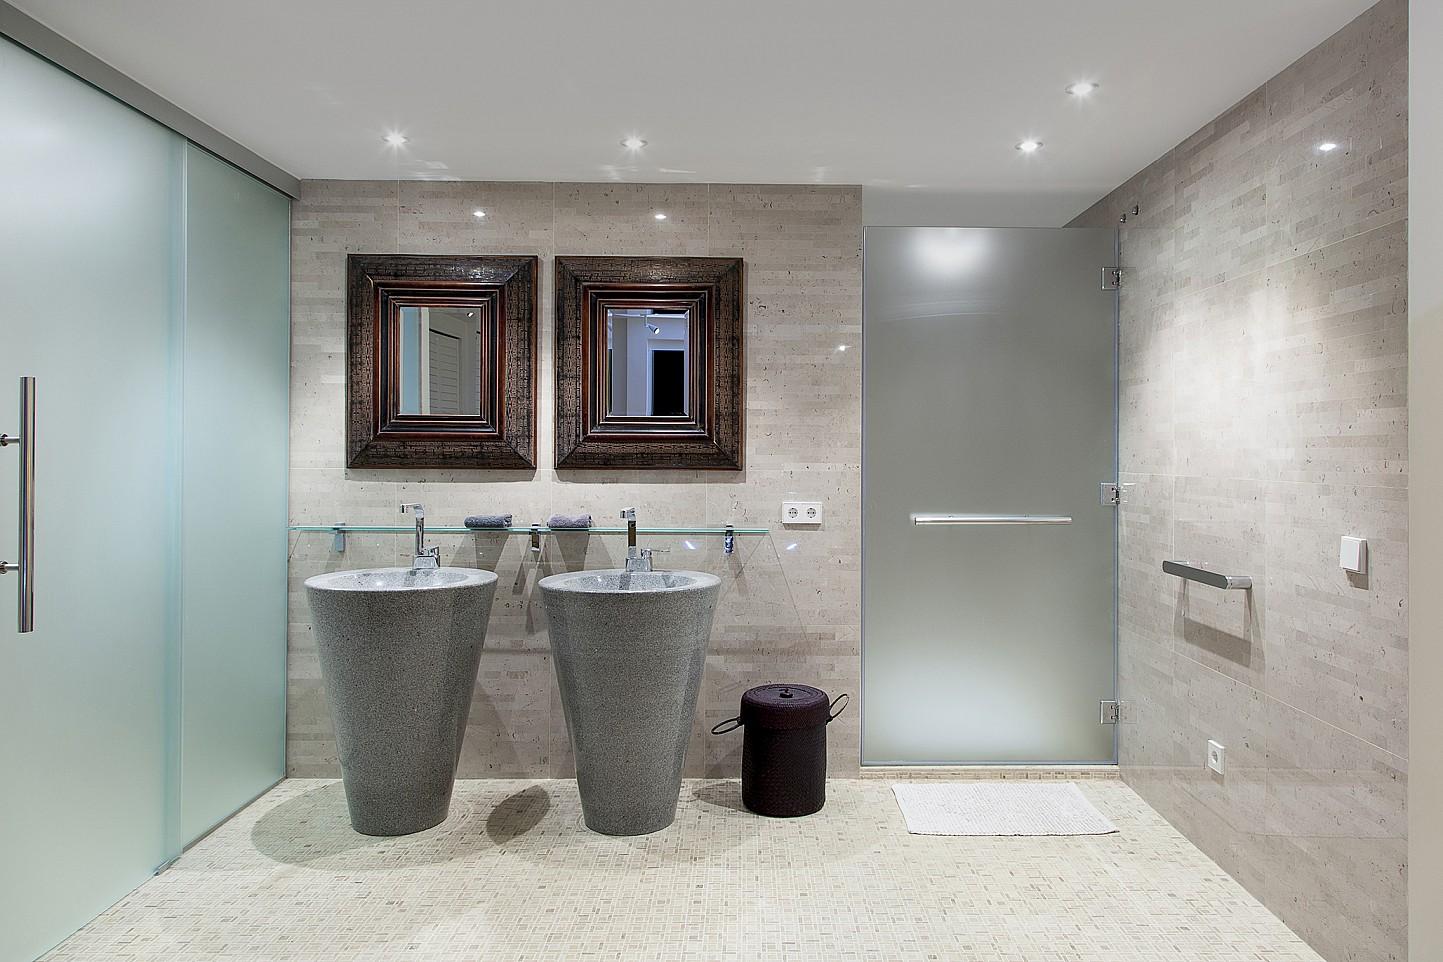 Ванная комната виллы в аренду в Эс Ведра